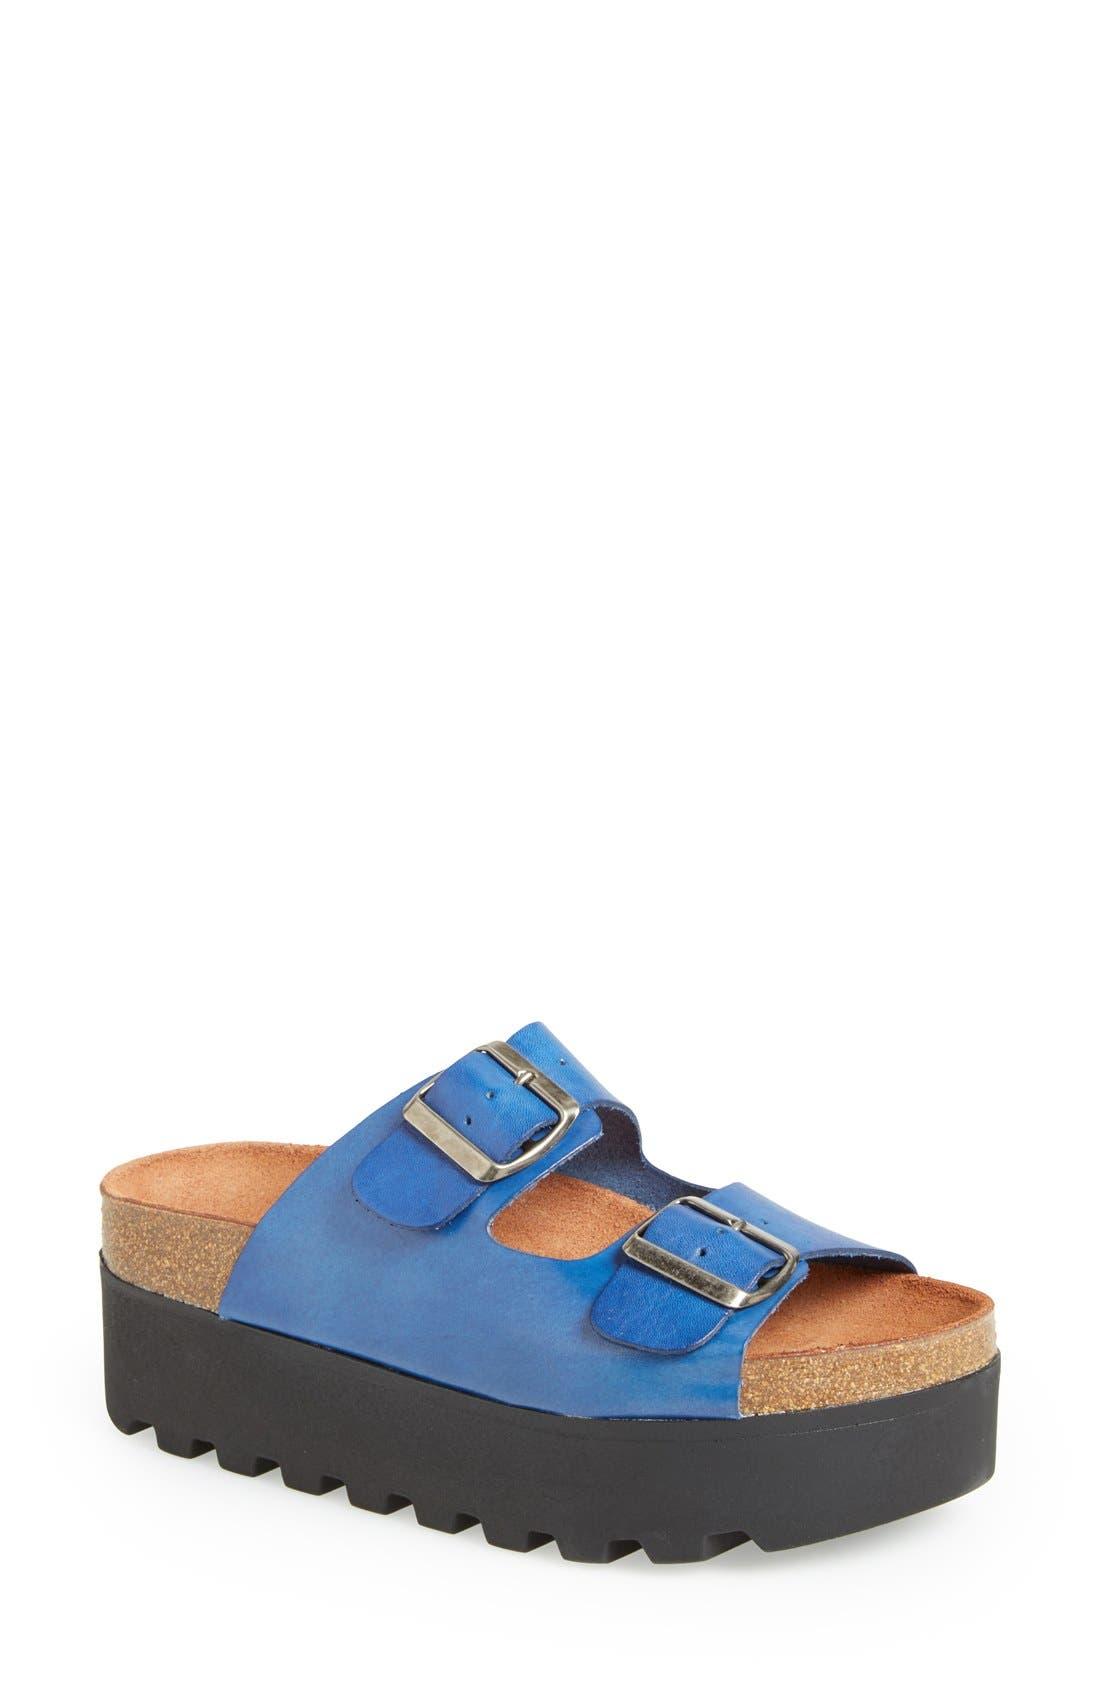 Alternate Image 1 Selected - SIXTYSEVEN 'Lisa' Leather Platform Sandal (Women)